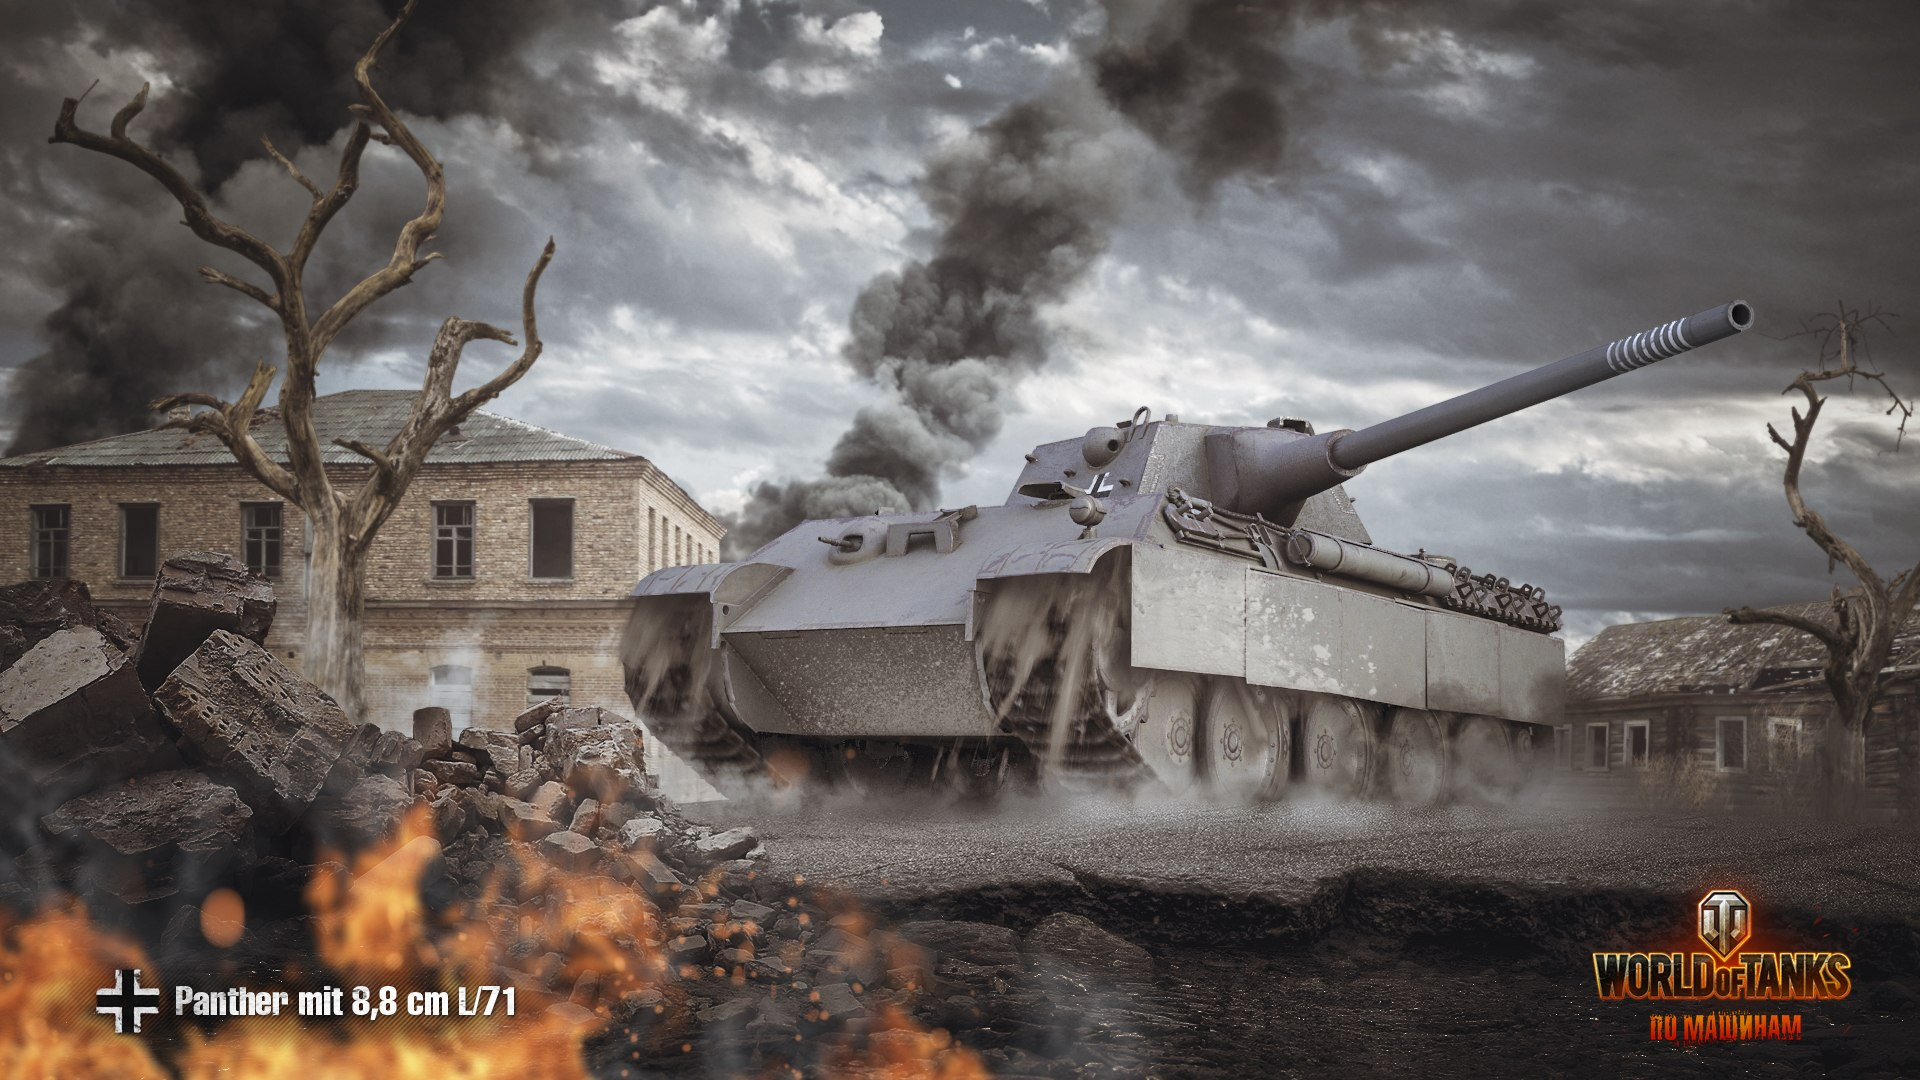 рисунок Panther mit 8,8cm L/71